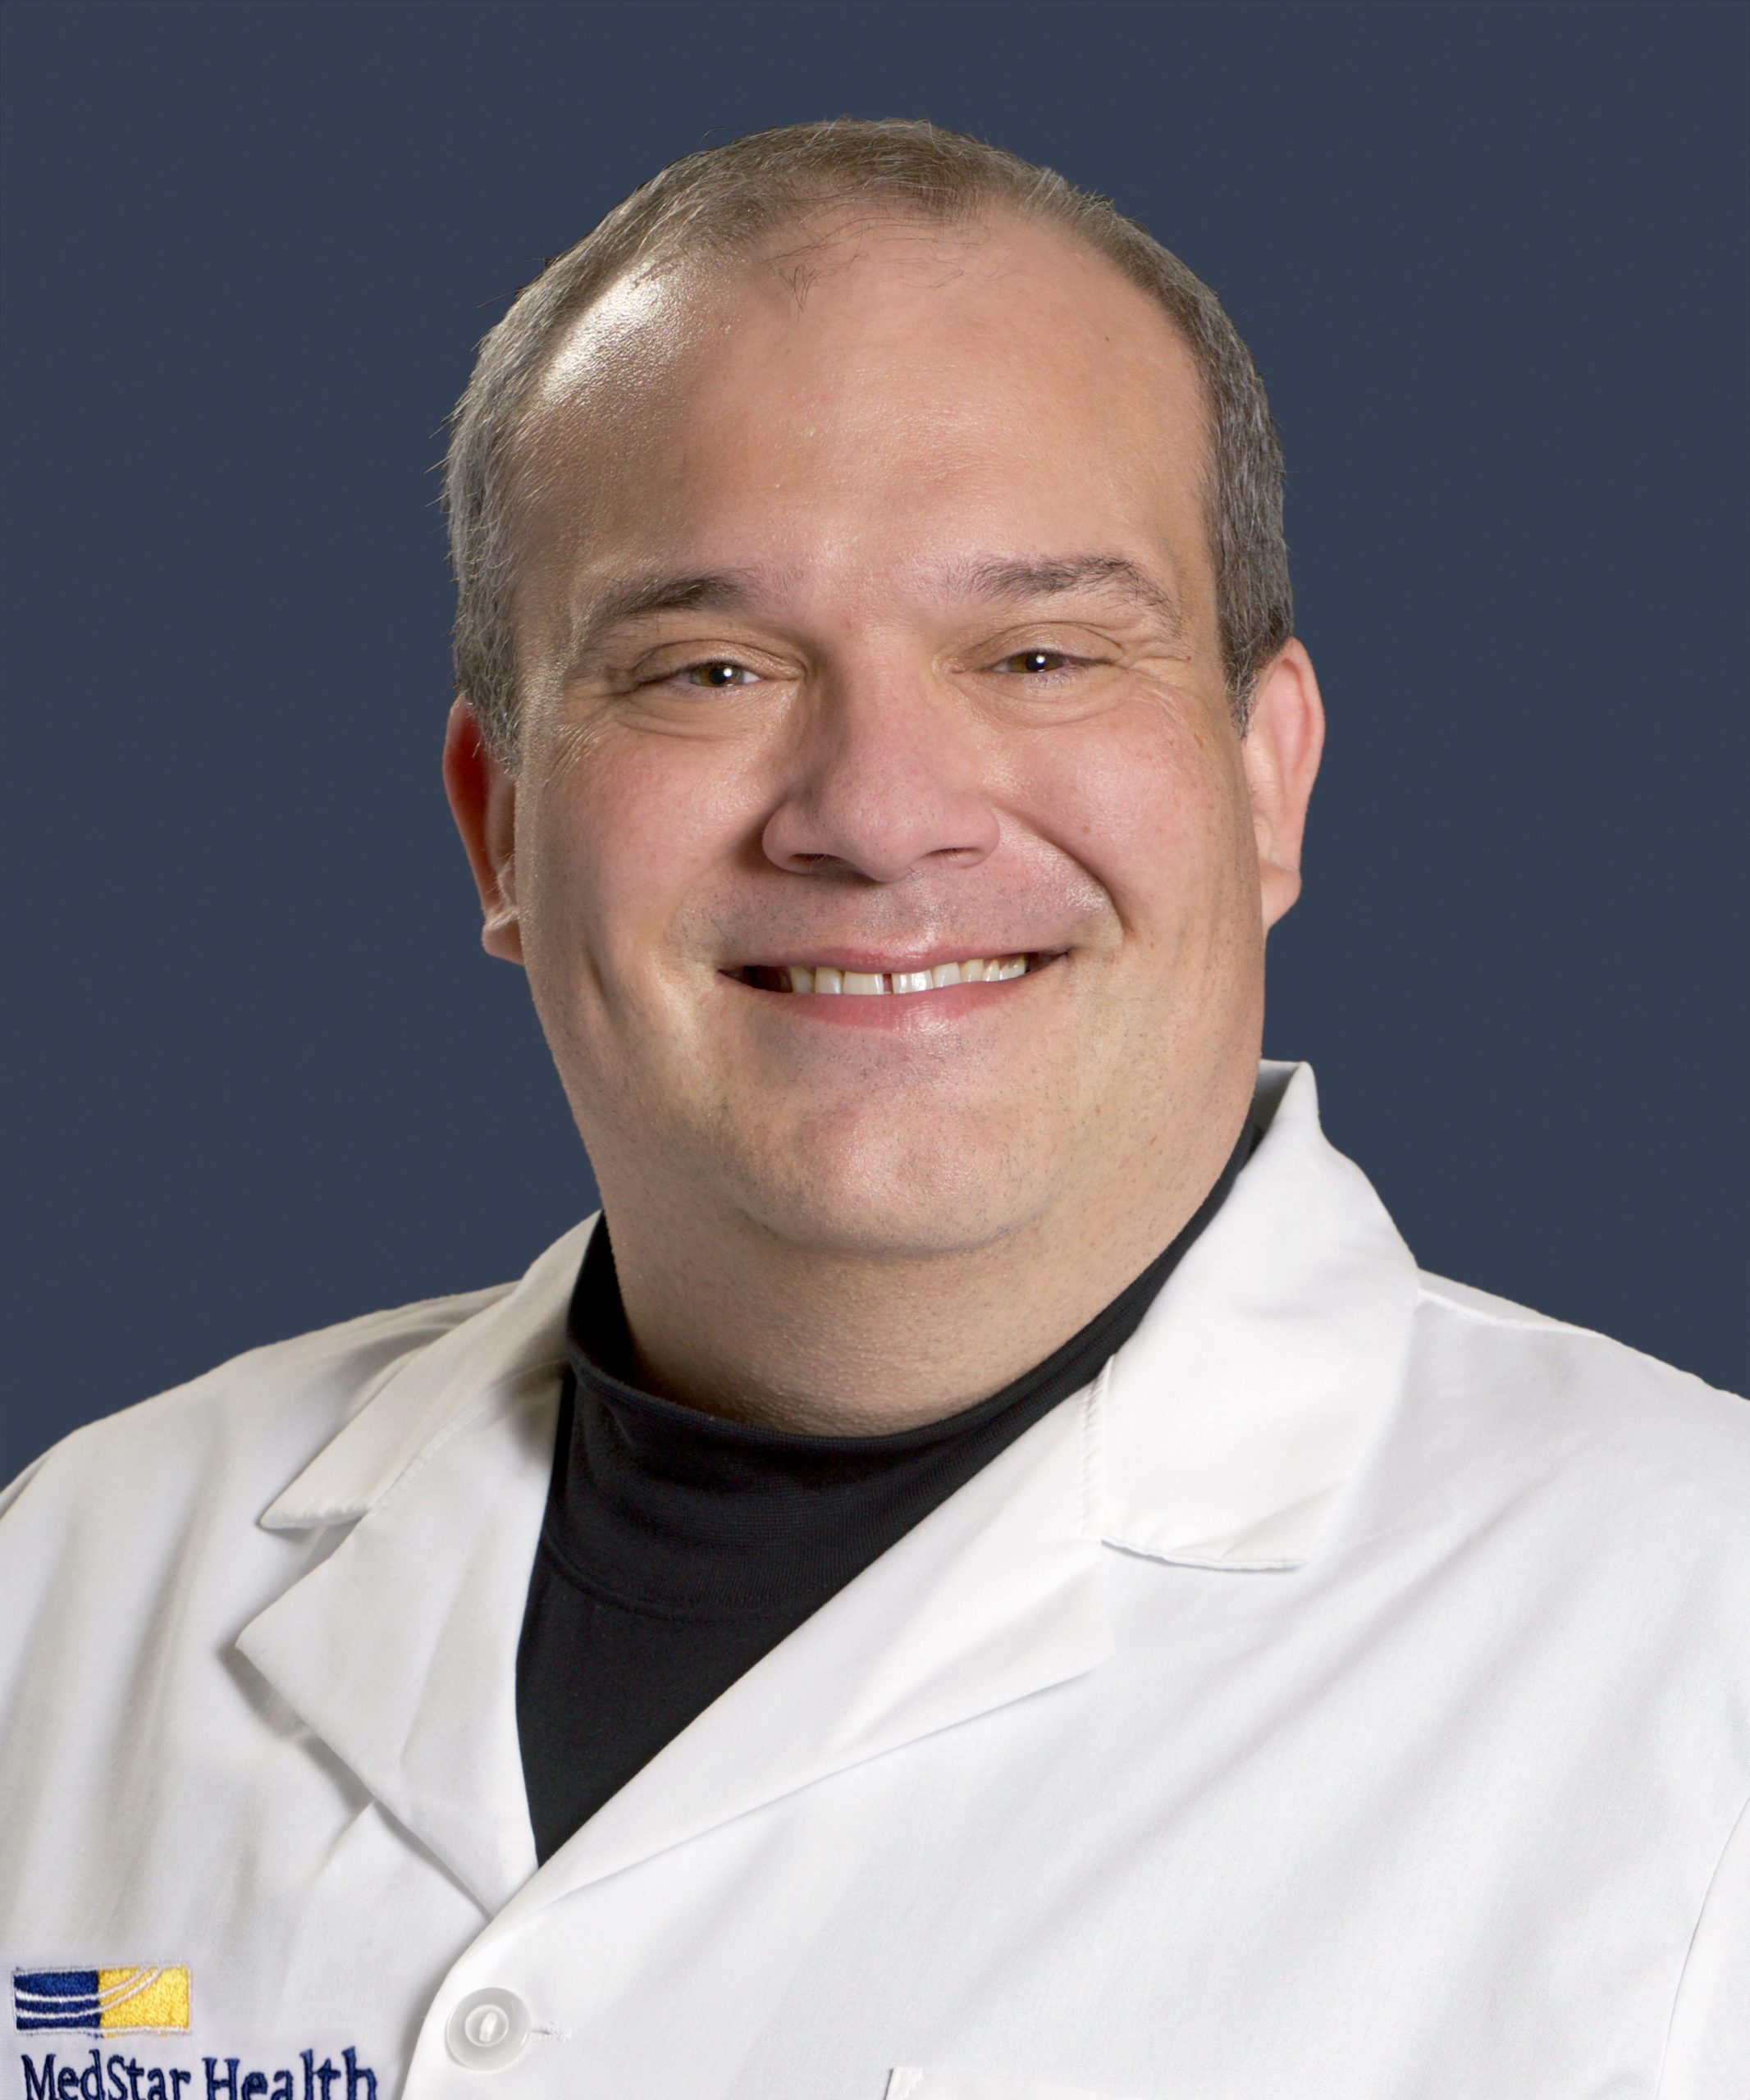 Christian Jones MD, MS